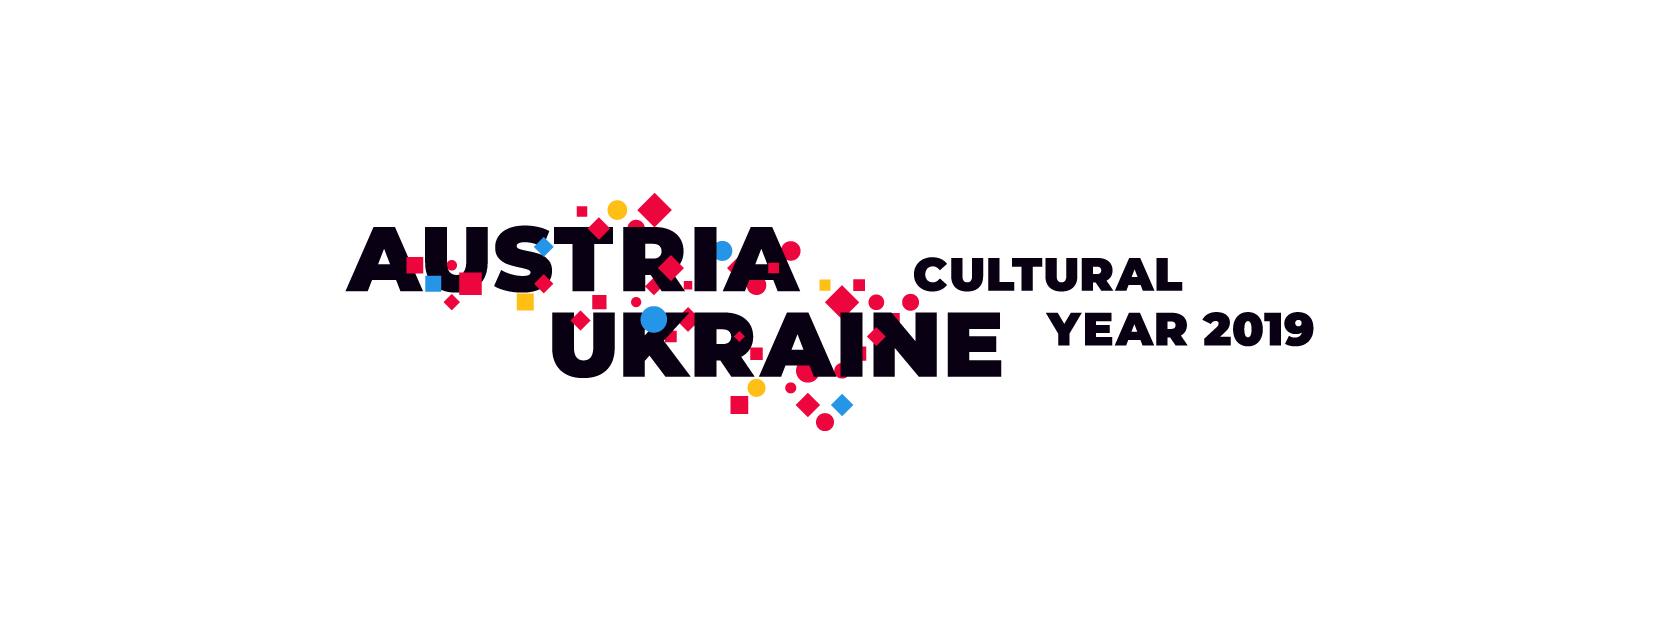 Austria Ukraine Cultural Year 2019